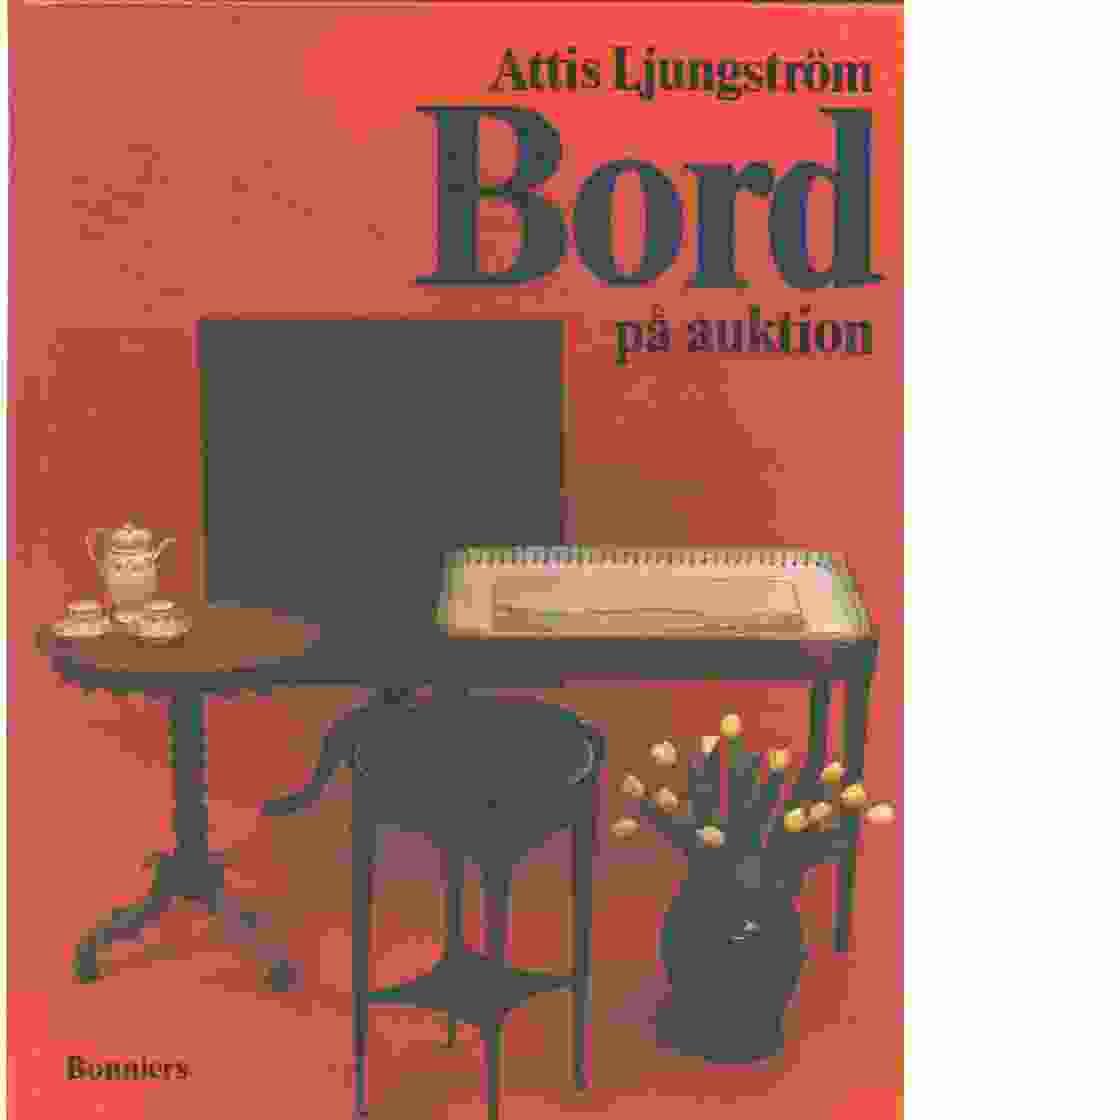 Bord på auktion - Ljungström, Astrid